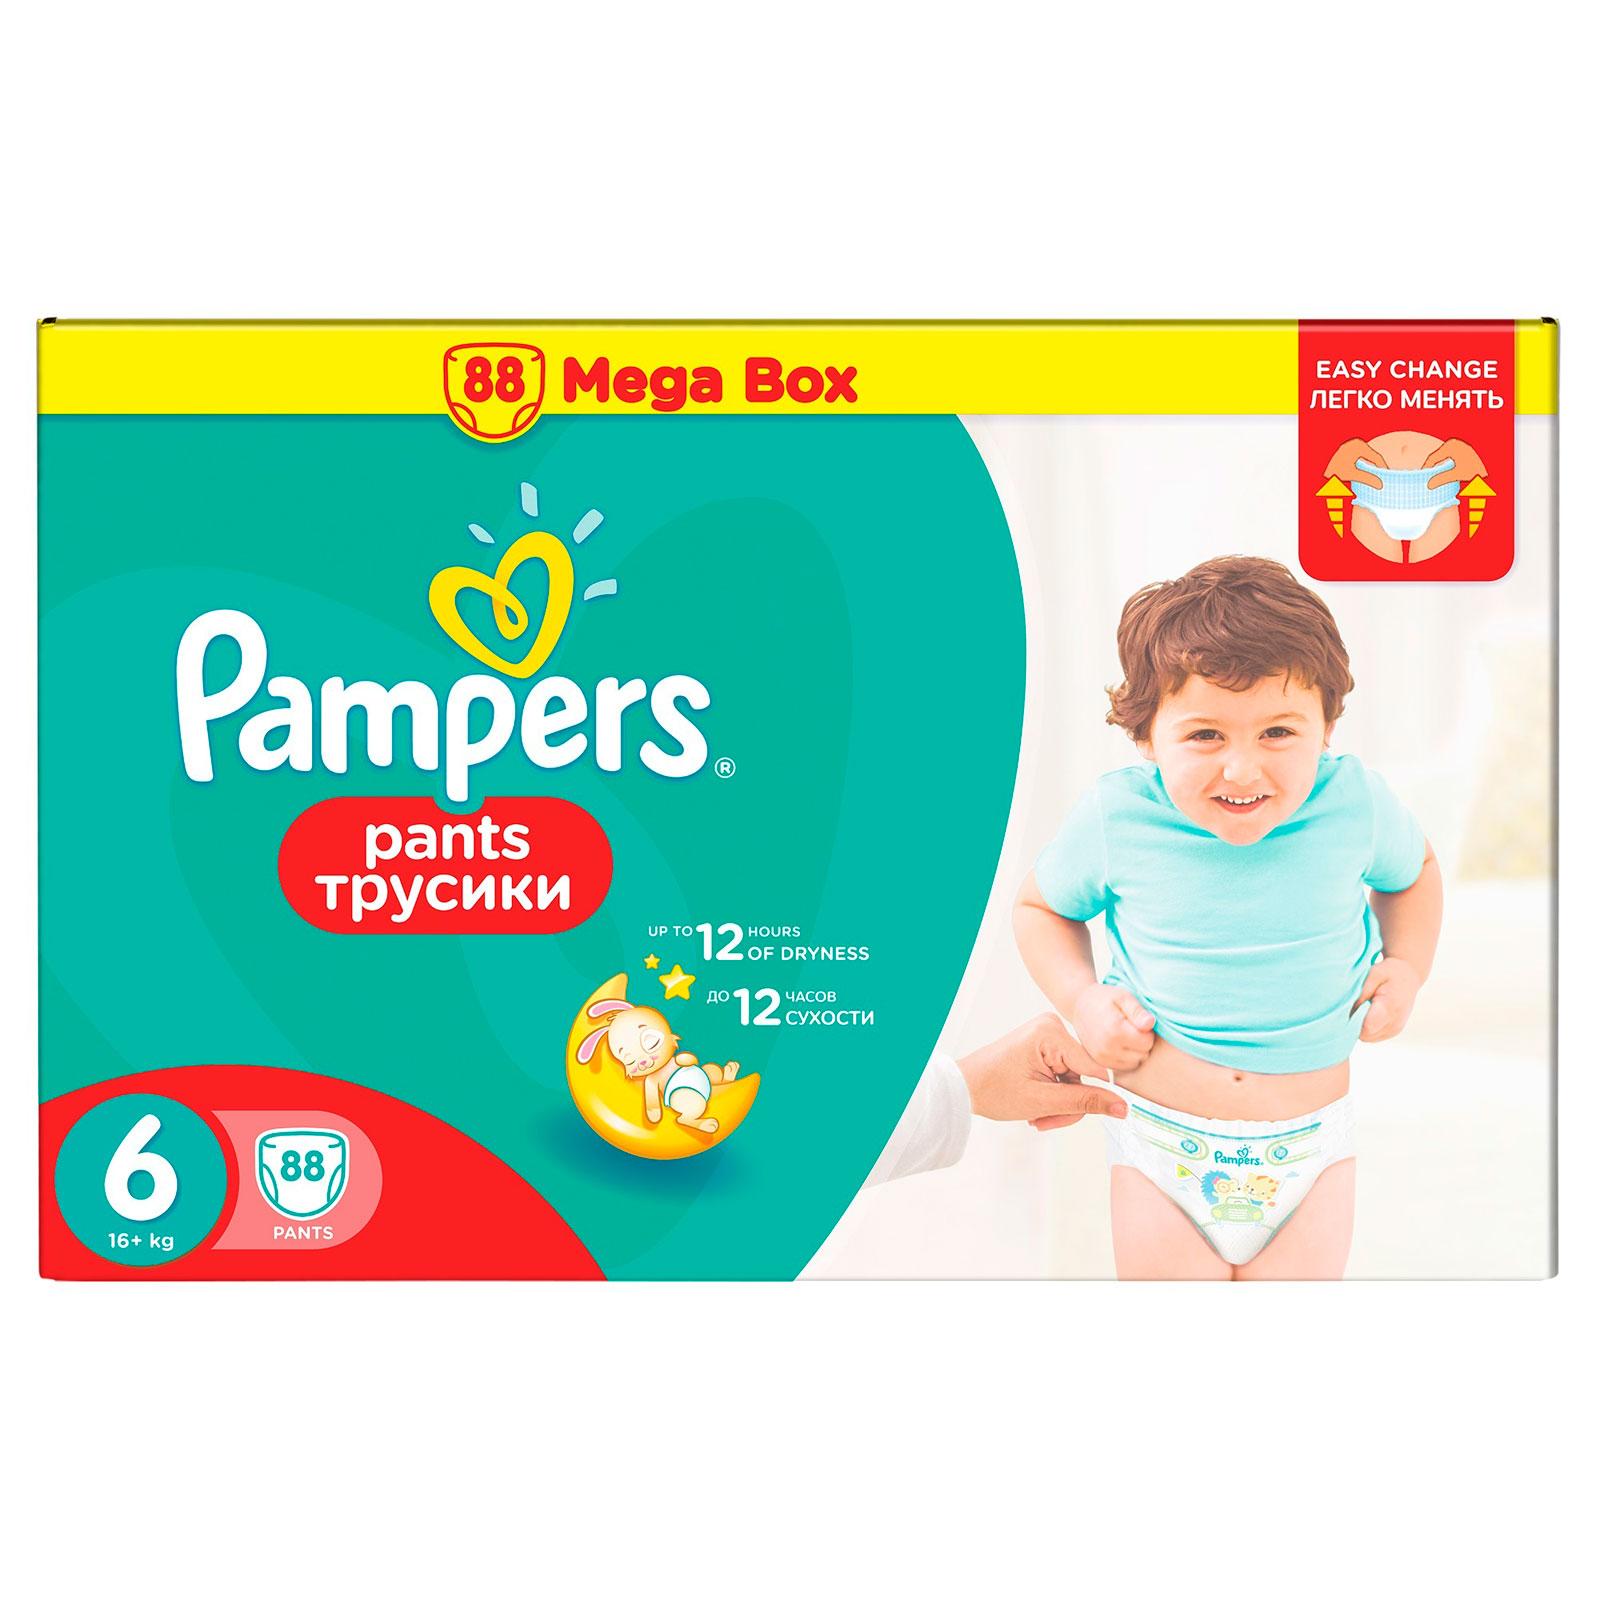 Трусики Pampers Pants Extra Large 16+ кг (88 шт) размер 6<br>